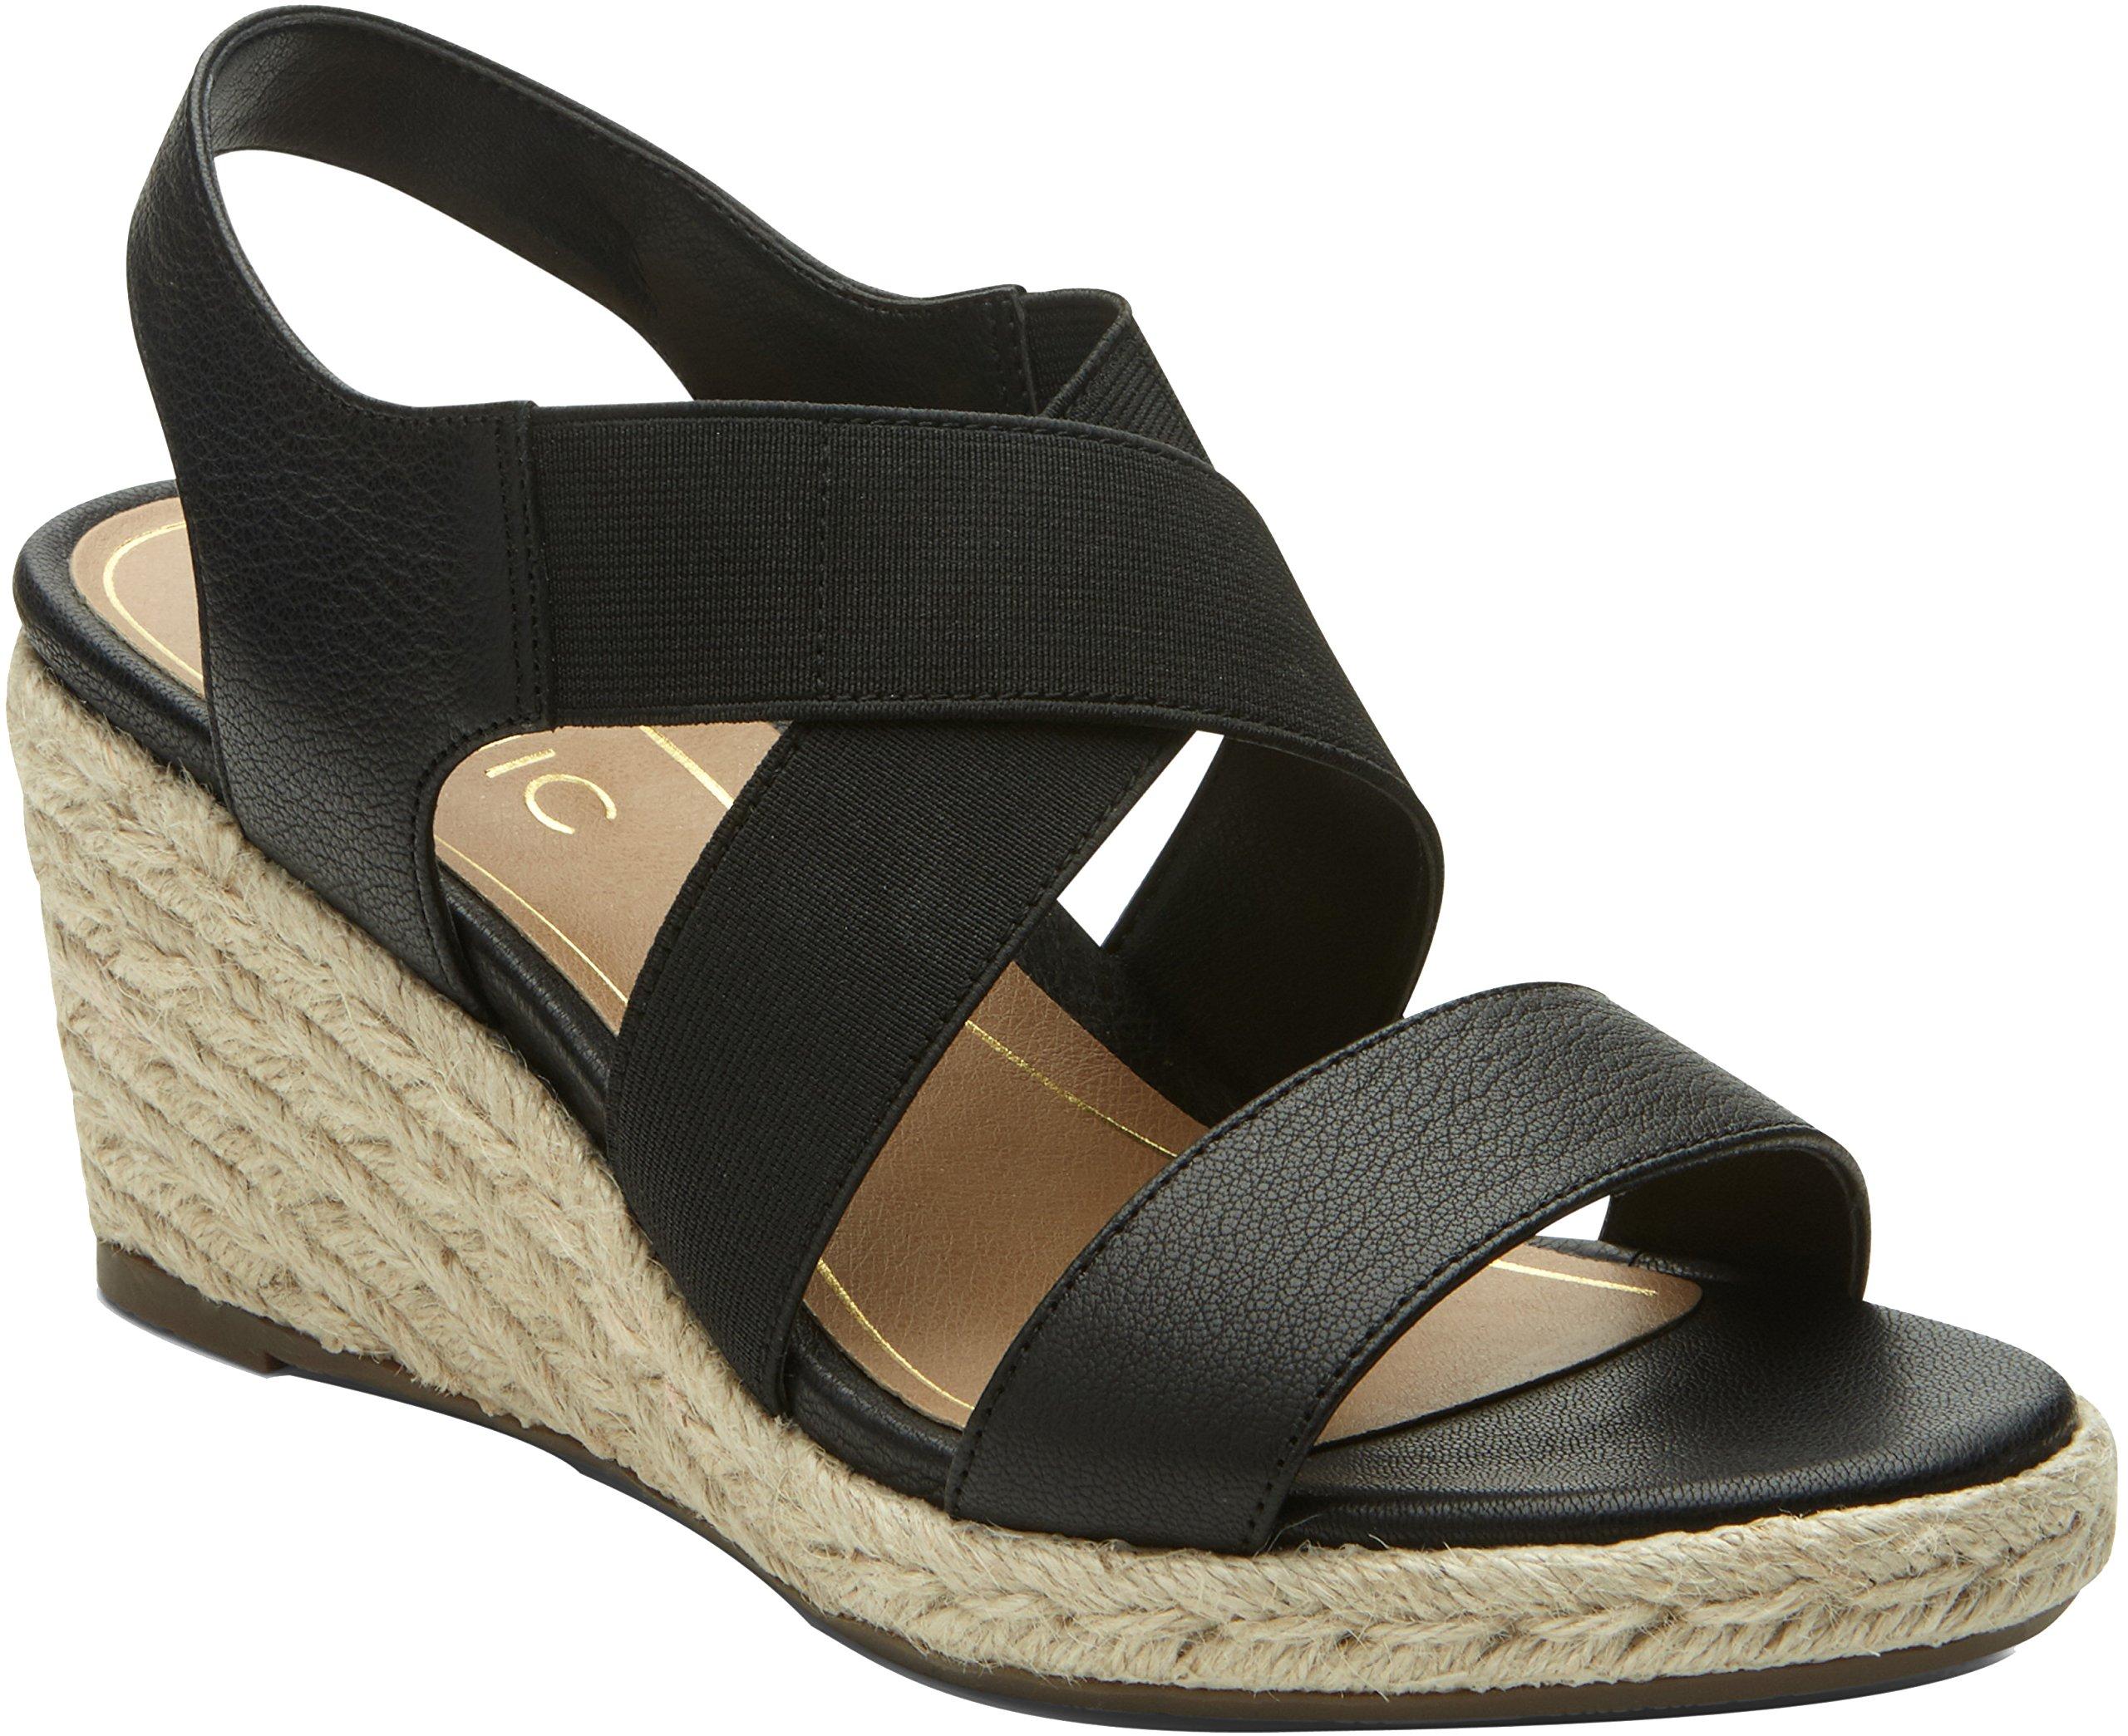 Vionic Tulum Ainsleigh - Womens Wedge Sandal Black - 9 Wide